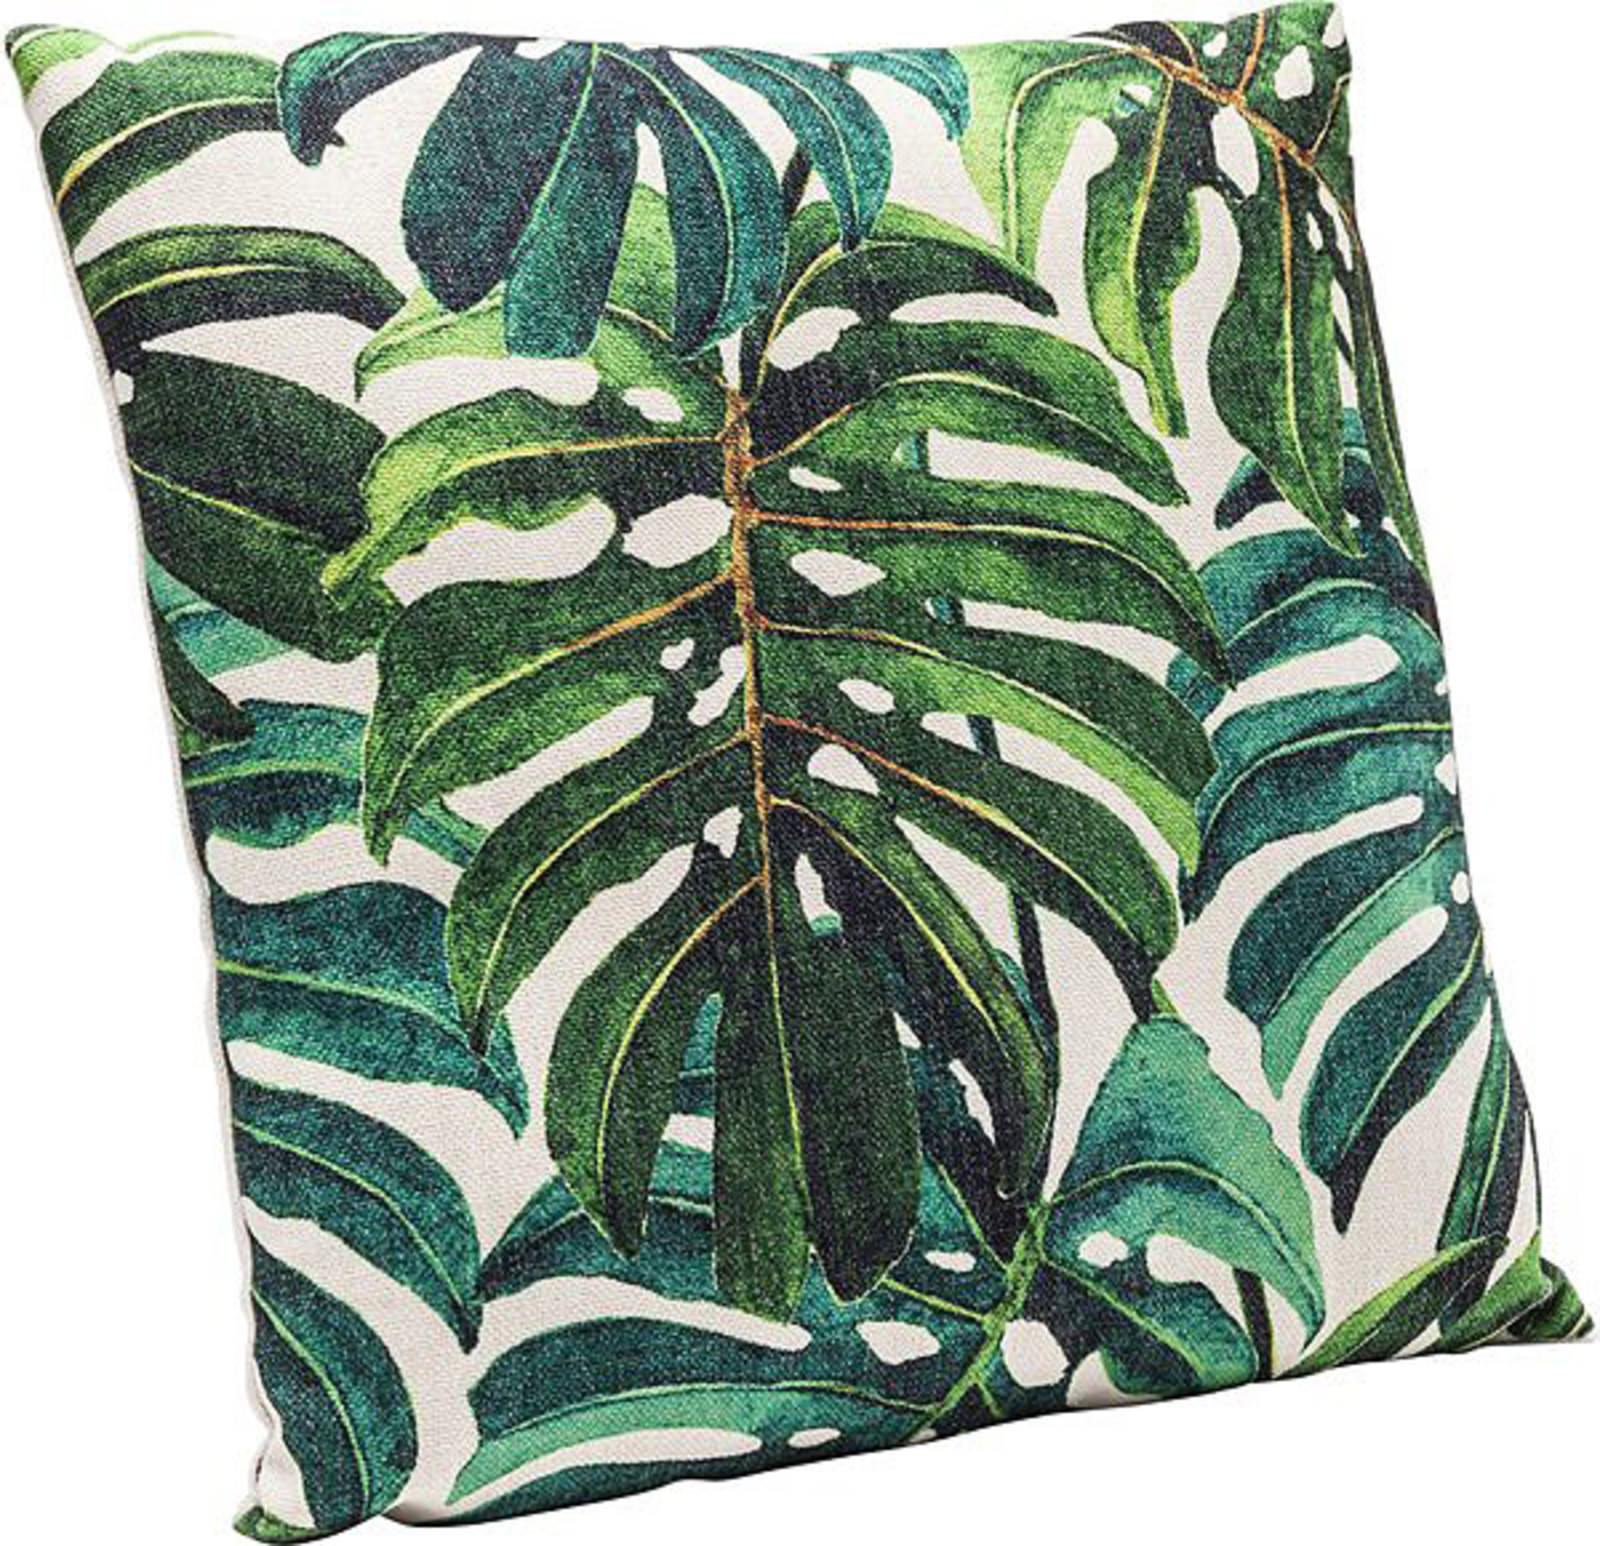 kare deko kissen jungle online entdecken knuffmann ihr m belhaus. Black Bedroom Furniture Sets. Home Design Ideas